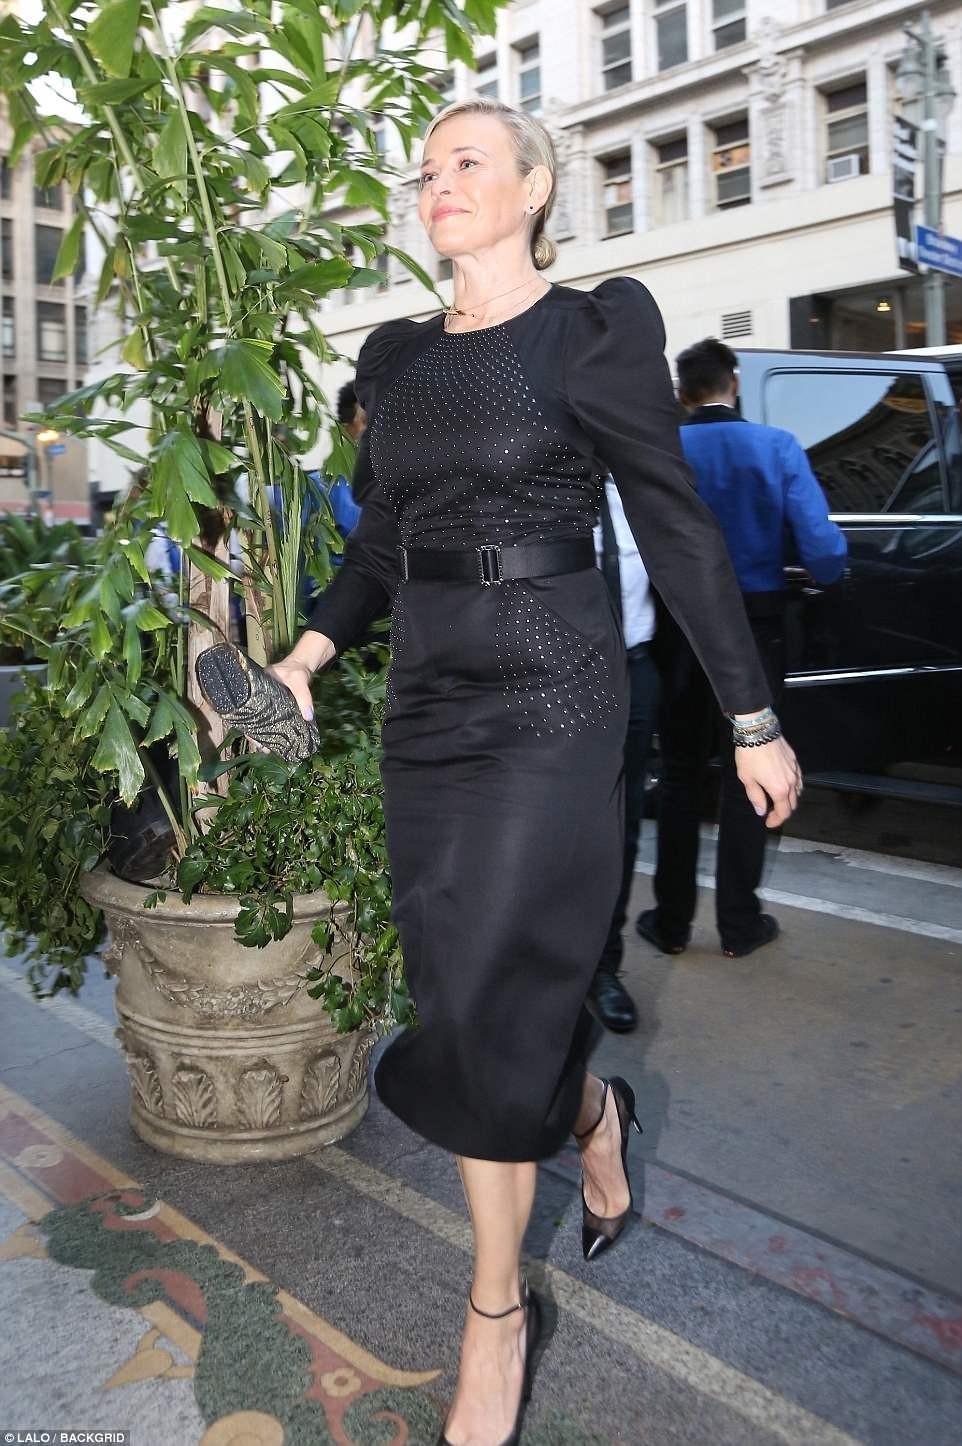 Actress Gwyneth Paltrow and Brad Falchuk hold